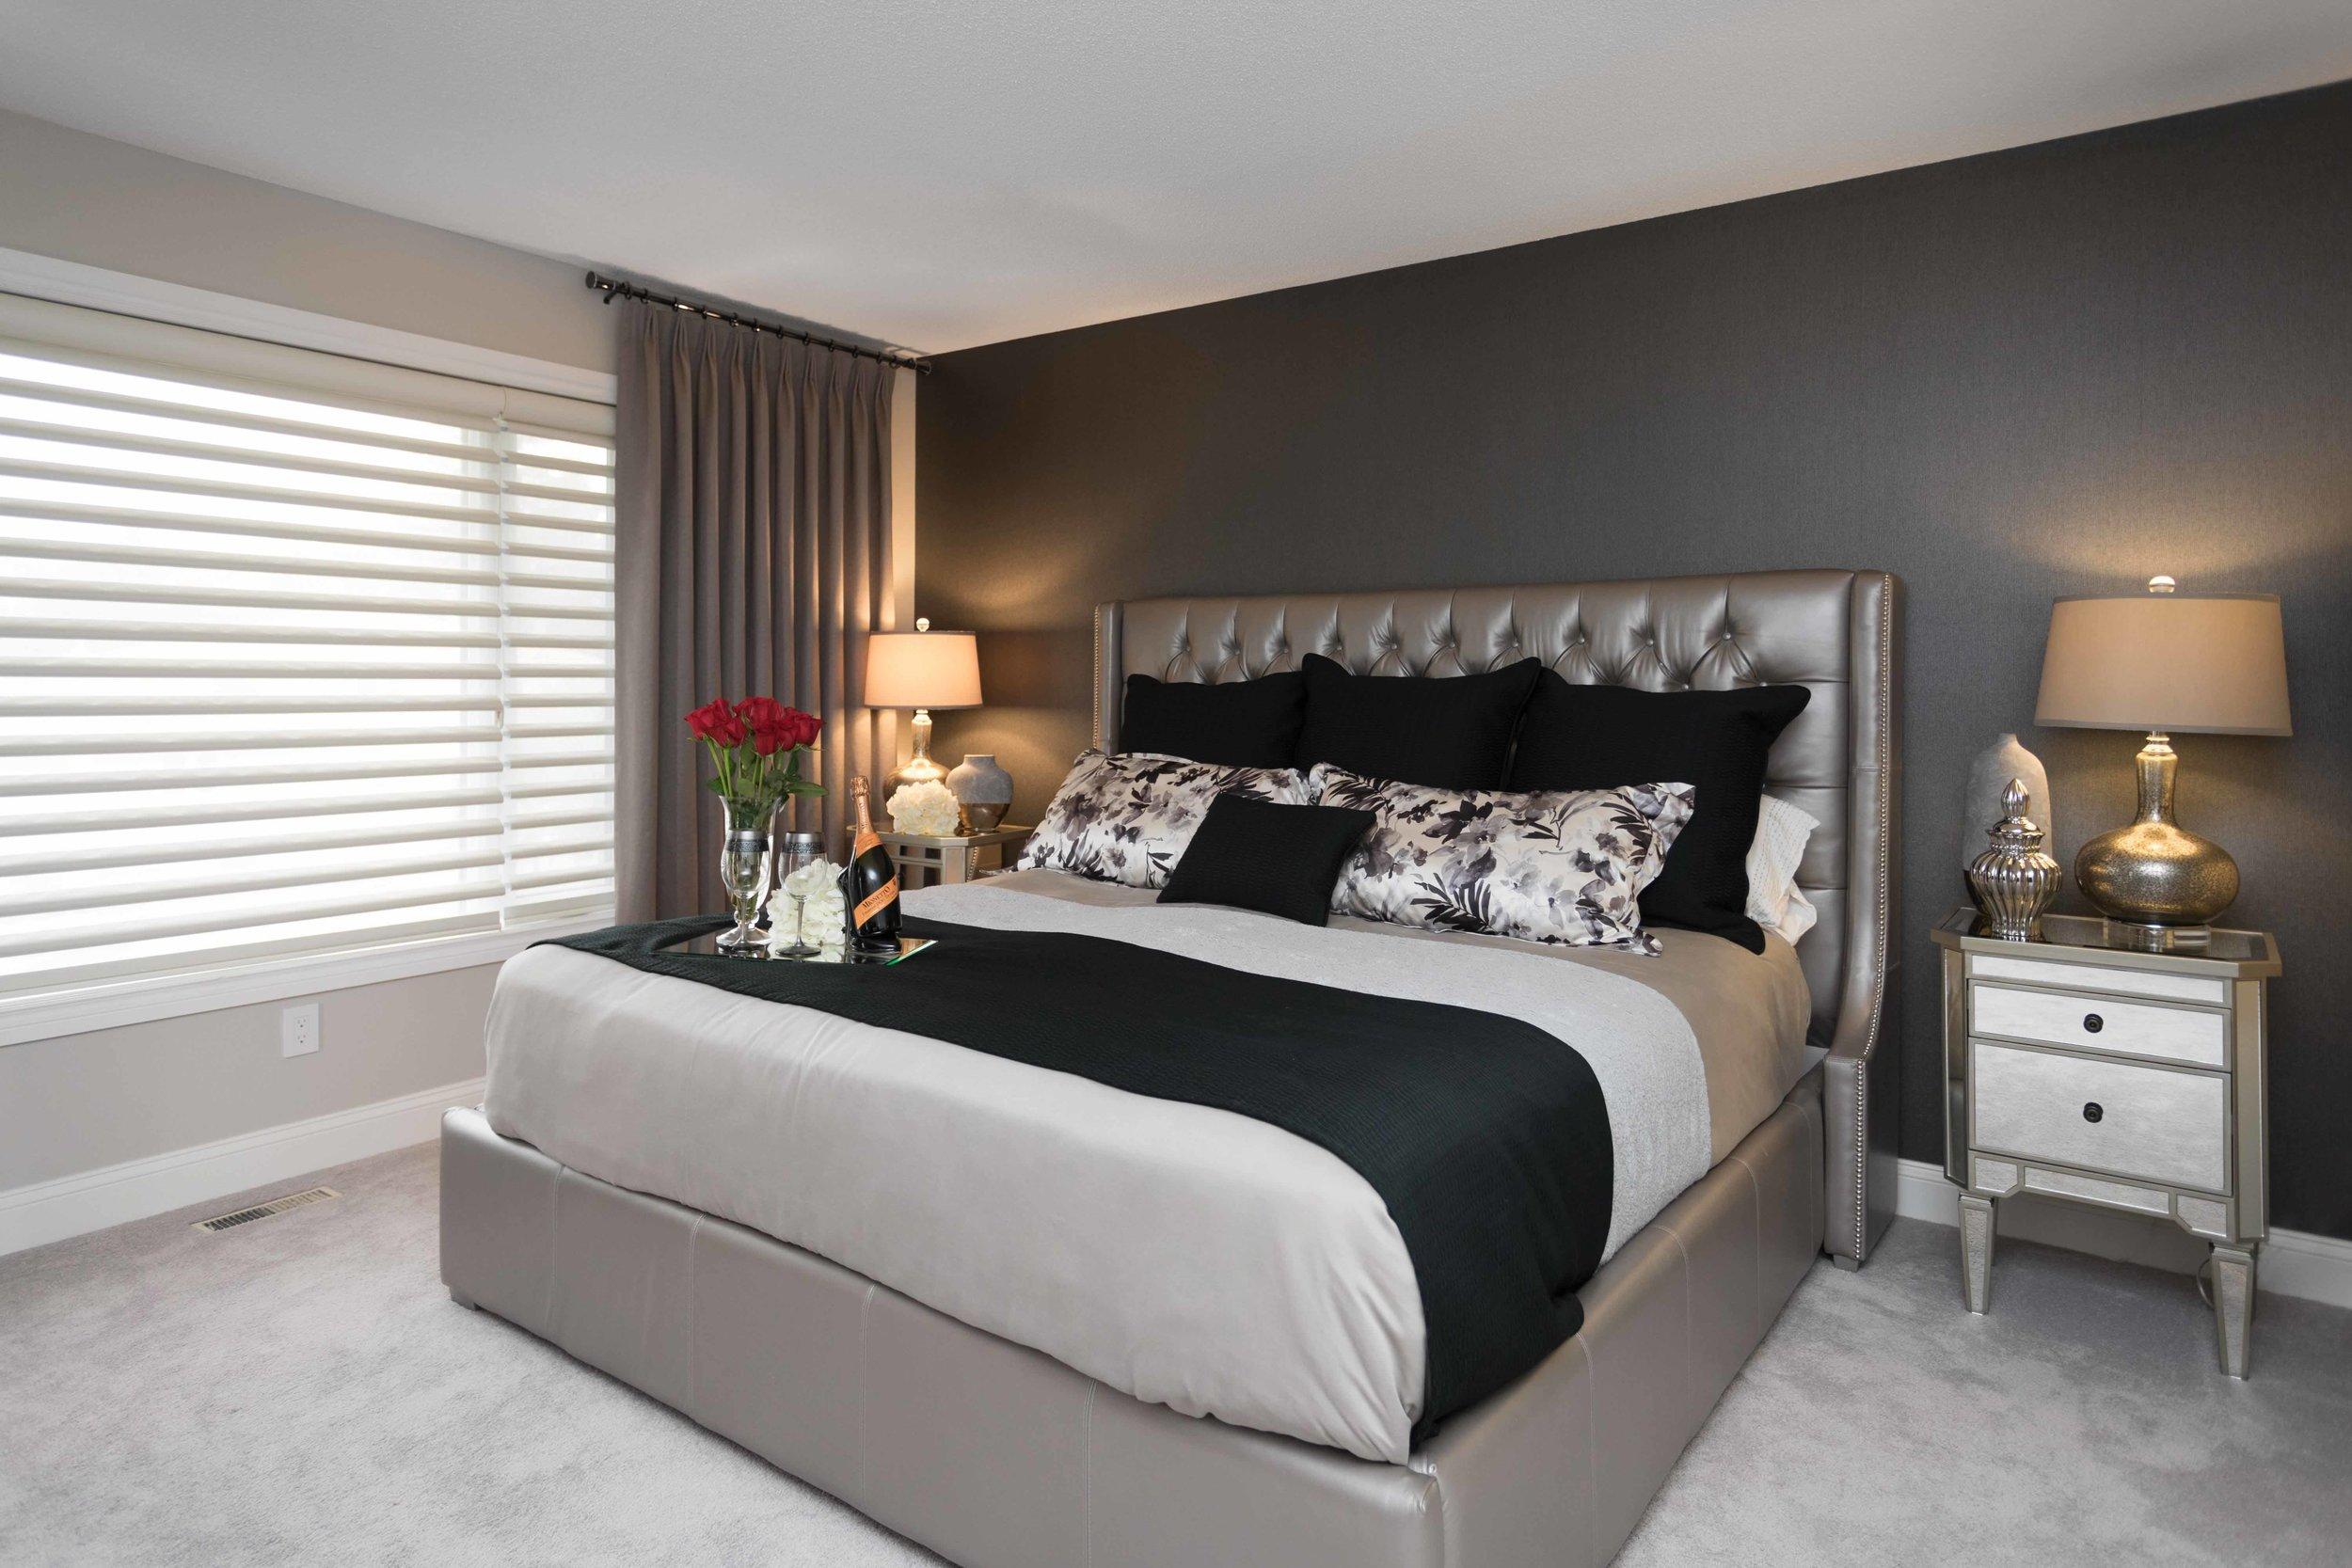 Picturesk-RL-Appelquist Bedrooms-15.jpg